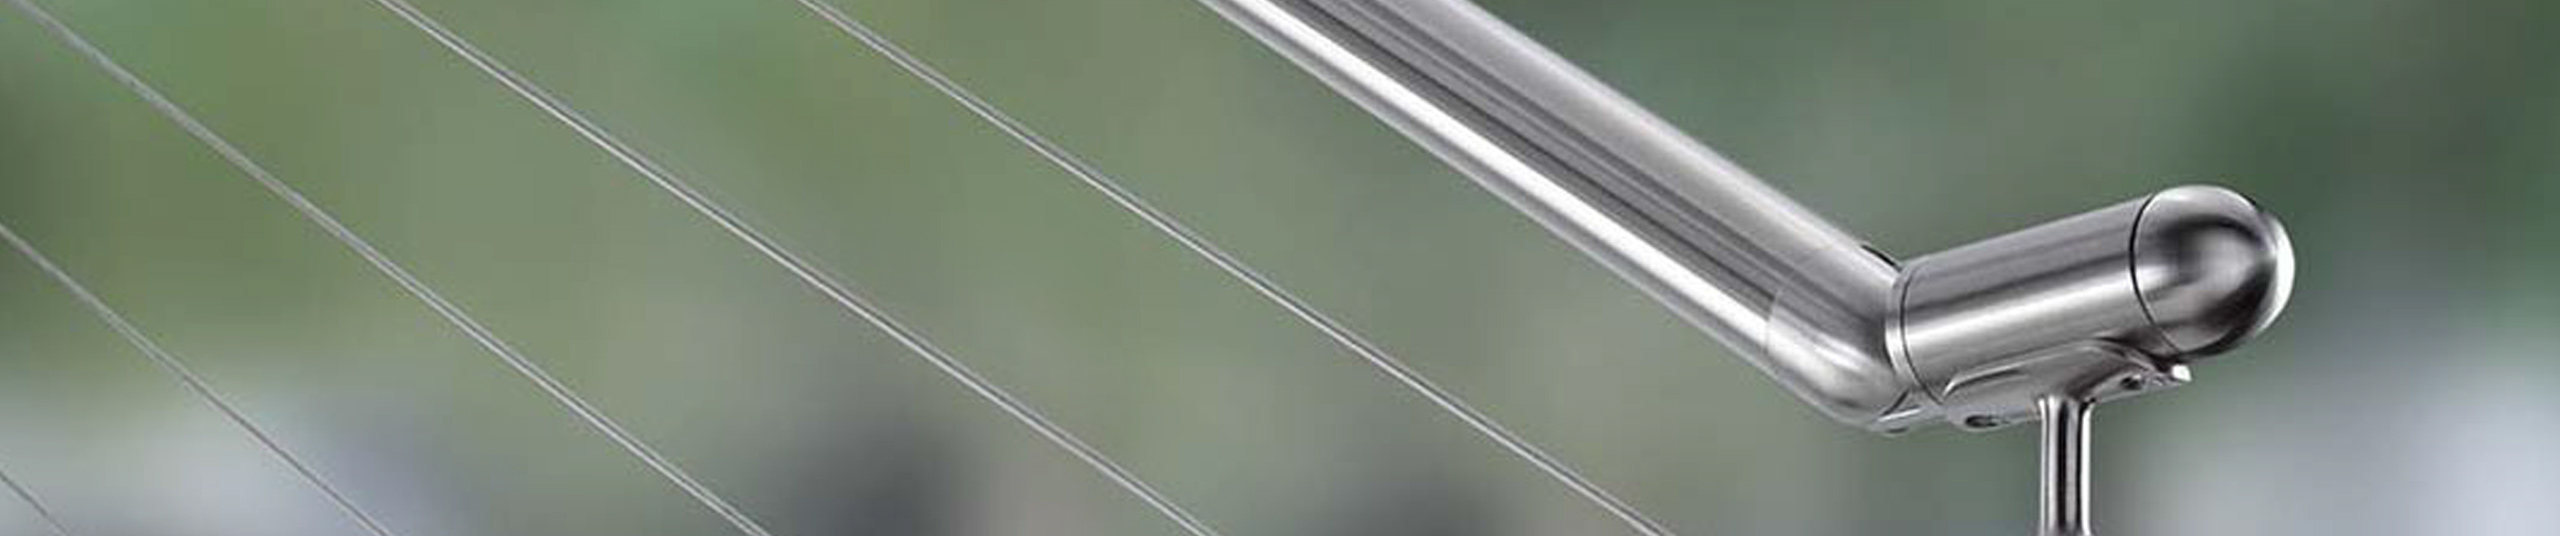 Hand Rail Systems